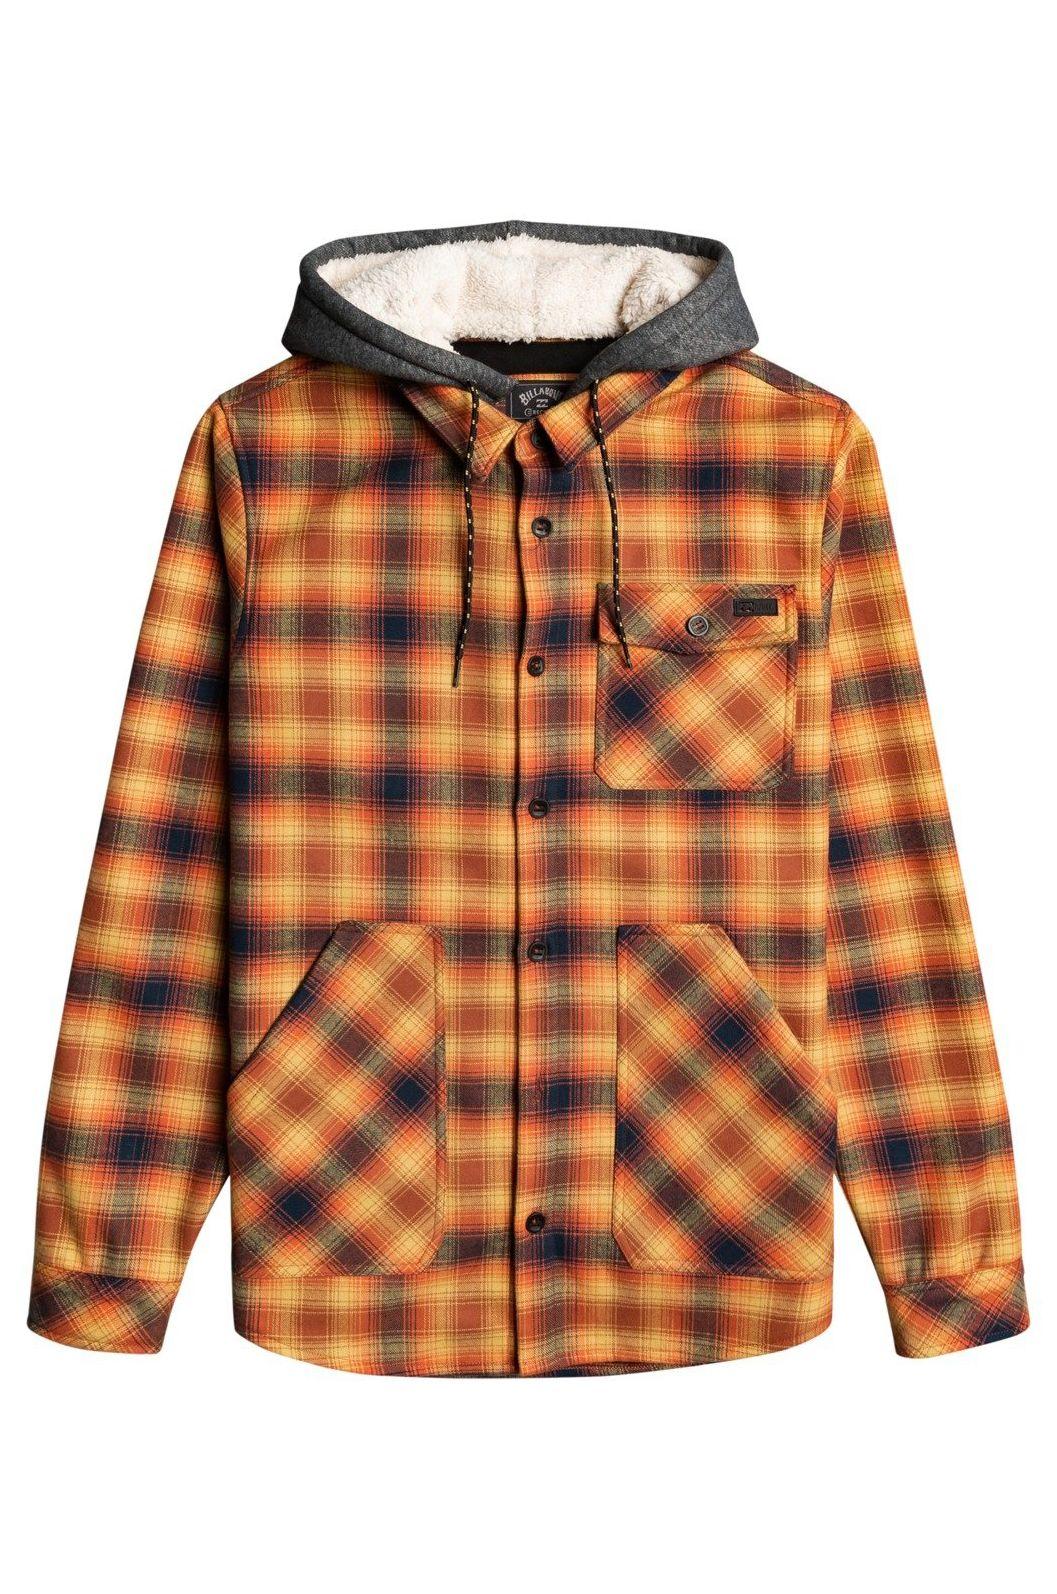 Camisa Billabong FURNACE BONDED FLANN ADVENTURE DIVISION Rust